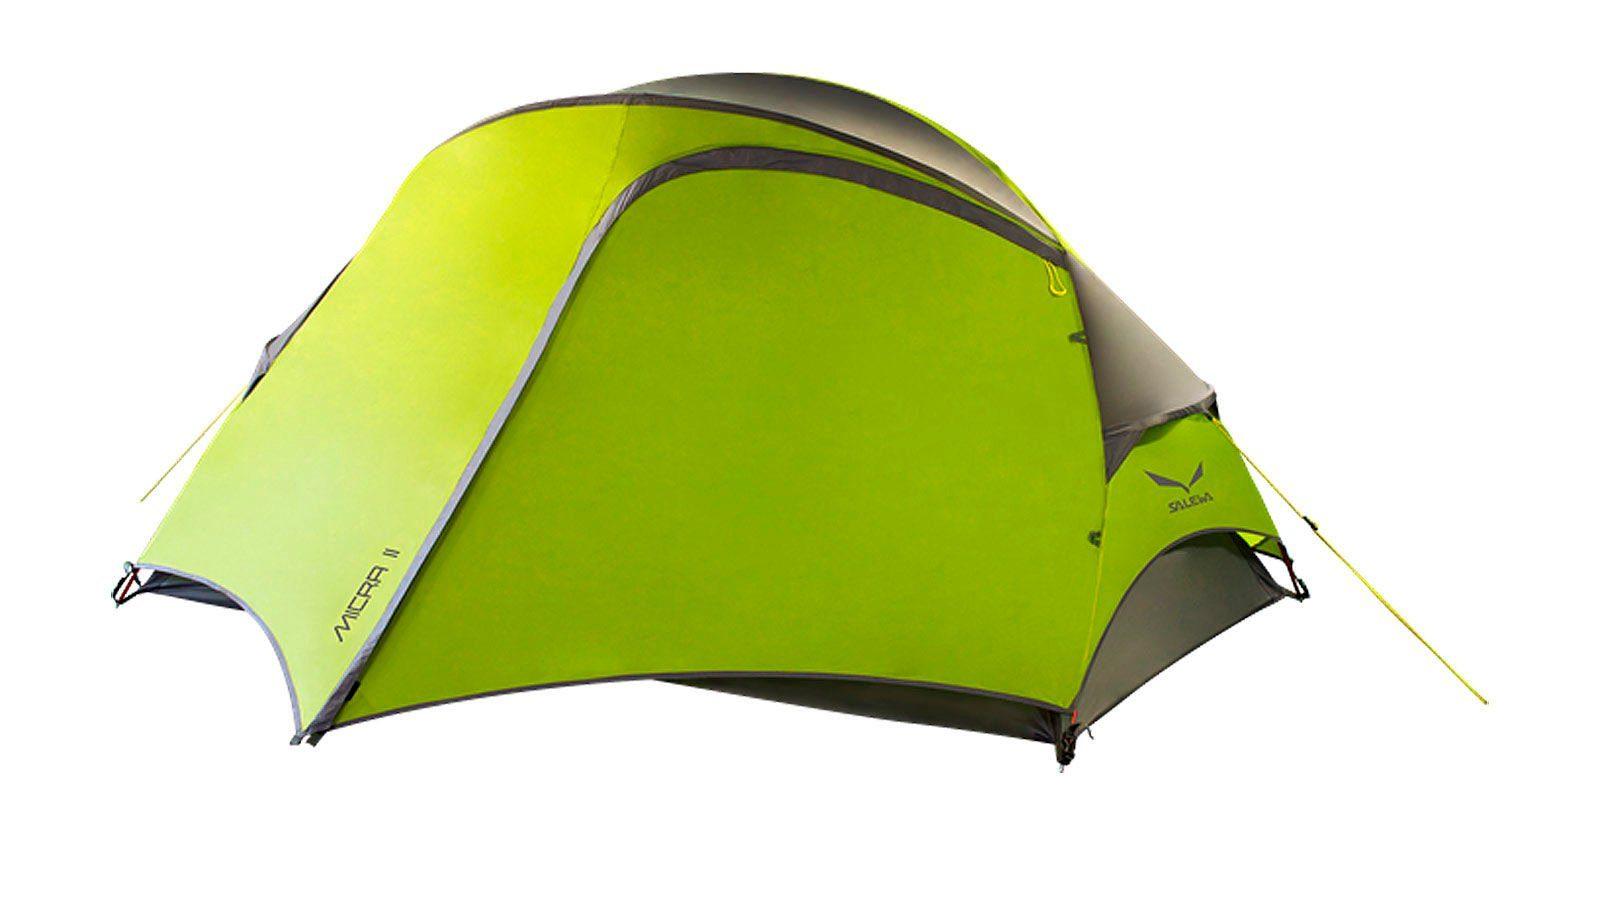 Salewa Zelt »Micra II Tent«